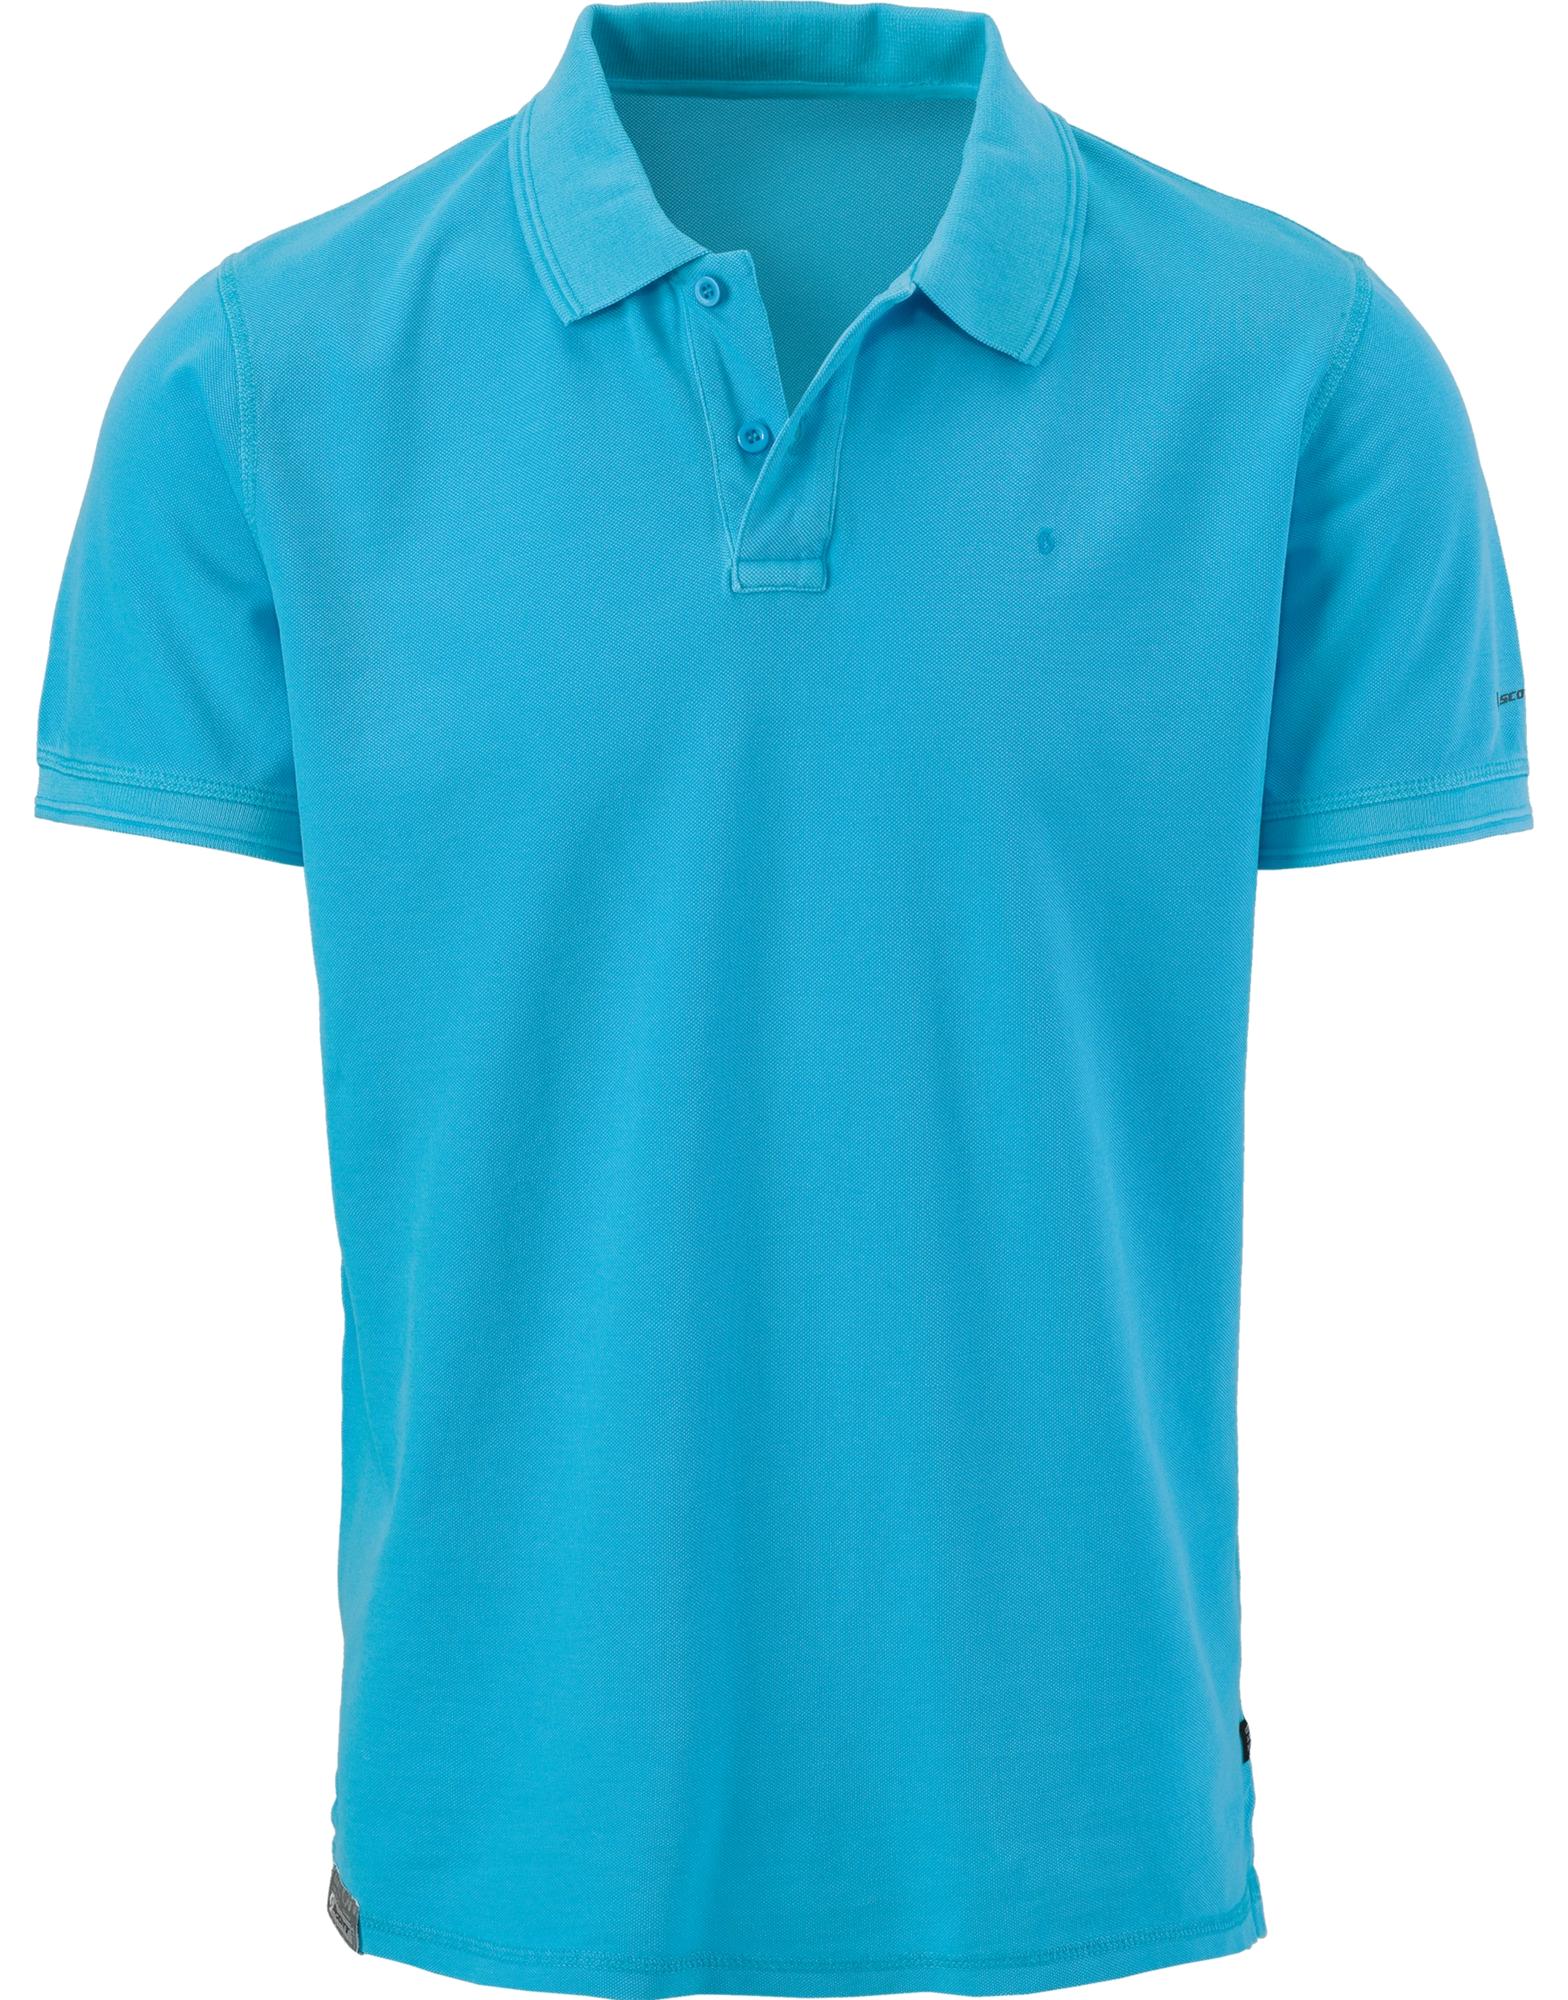 Blue Men S Polo Shirt Png Image Mens Polo T Shirts Simple Shirts Men S Polo Shirt